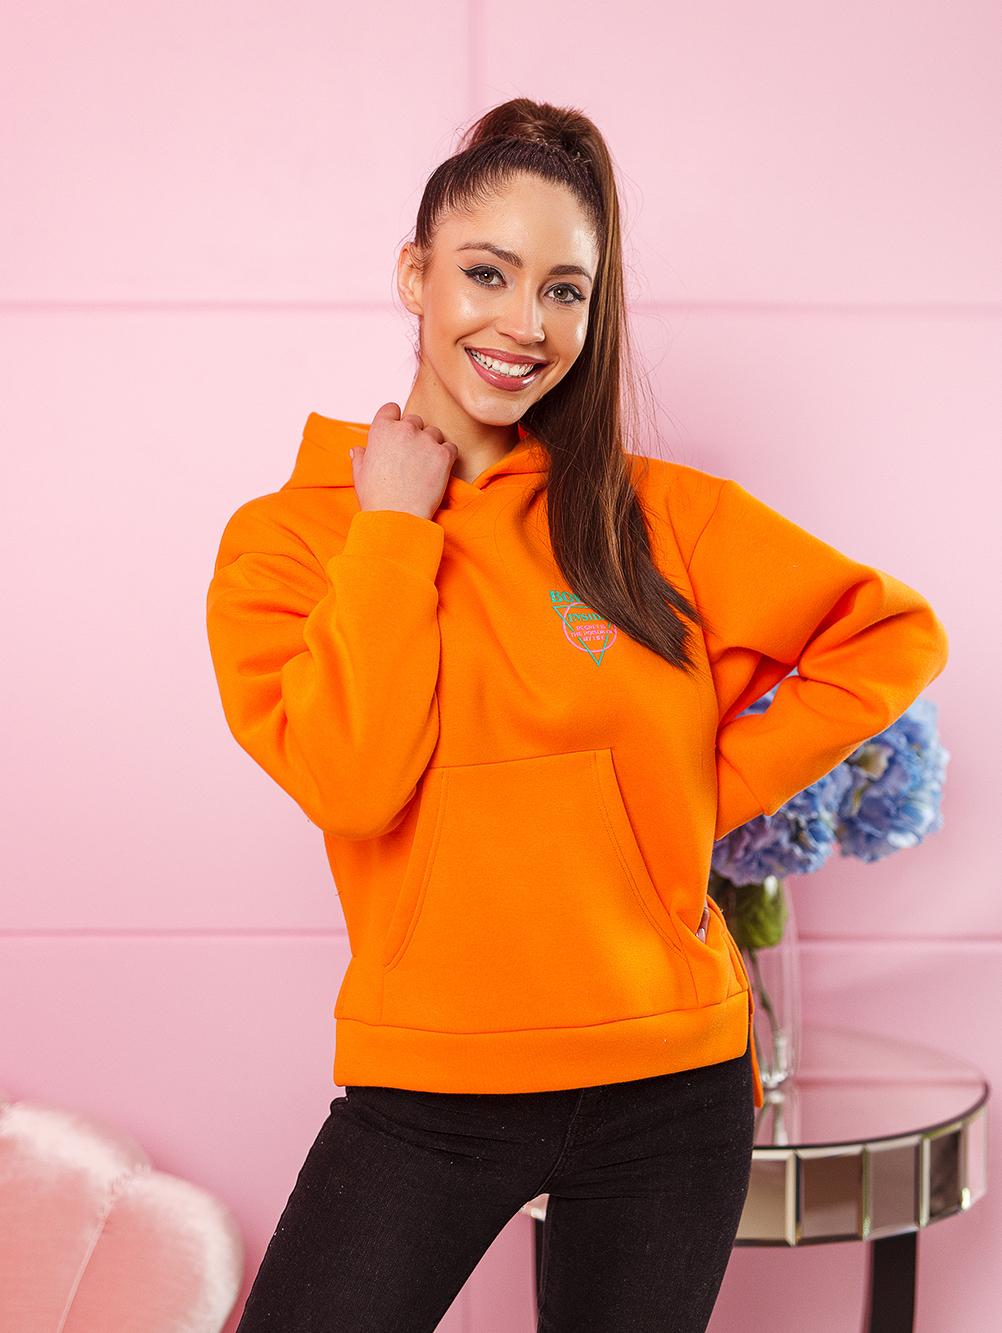 bluza damska bawelniana z zamkami po bokach nadruk na plecach i na piersi pomarancz (2)